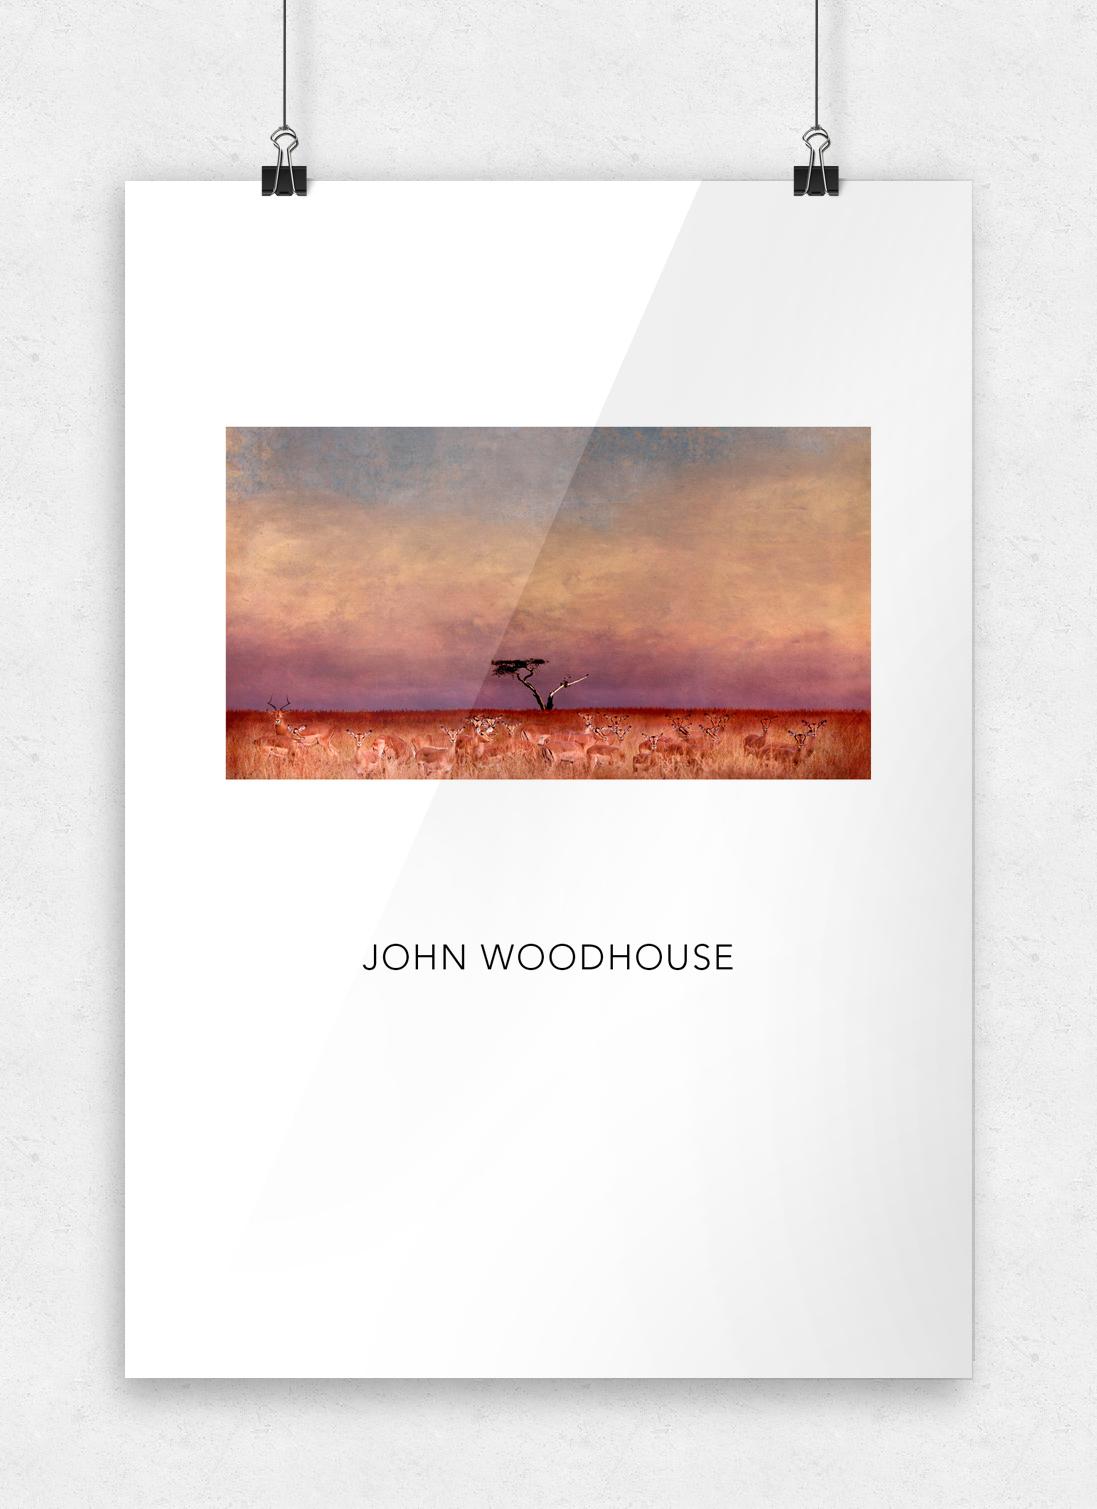 JW-Posters-Template_07.jpg